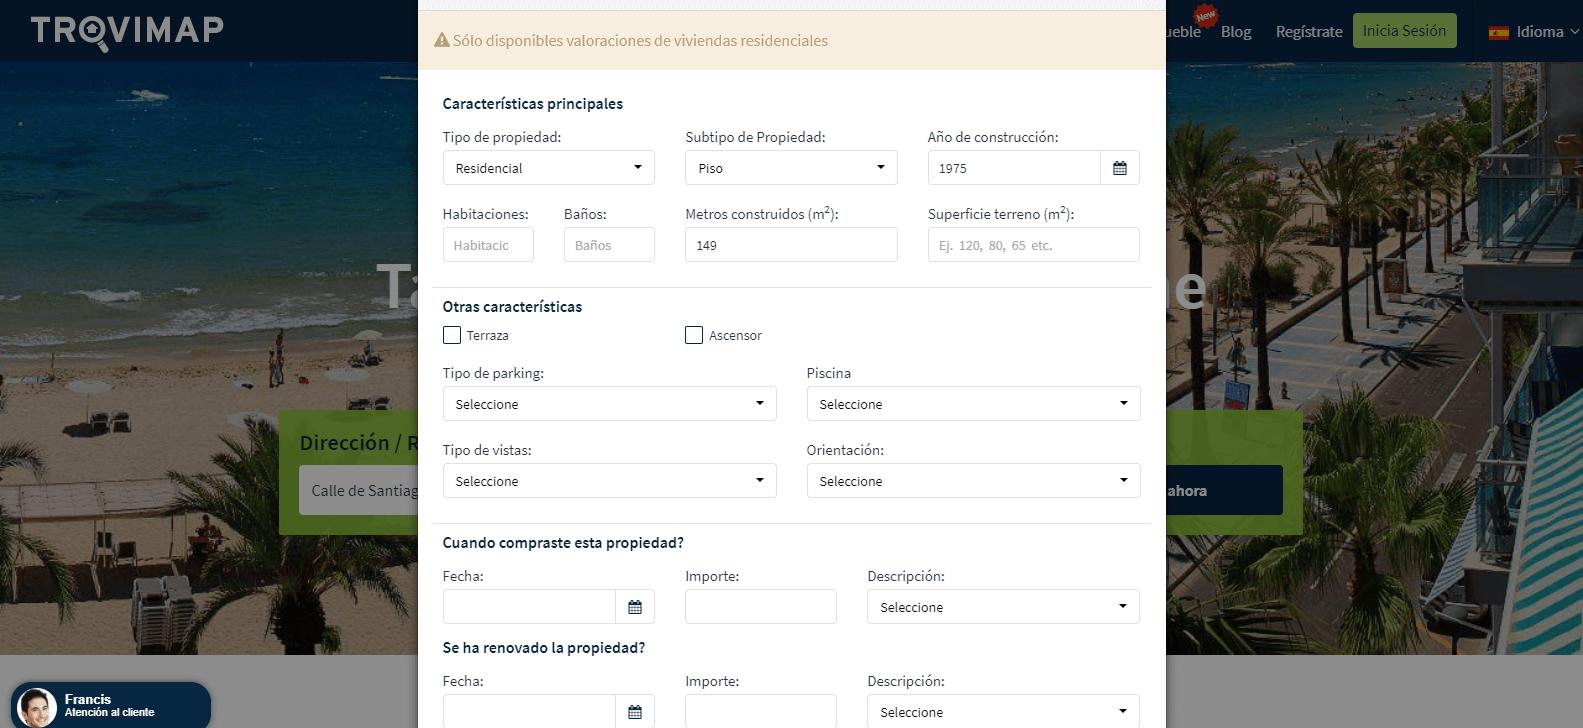 trovimap herramienta de valoracion gratuita